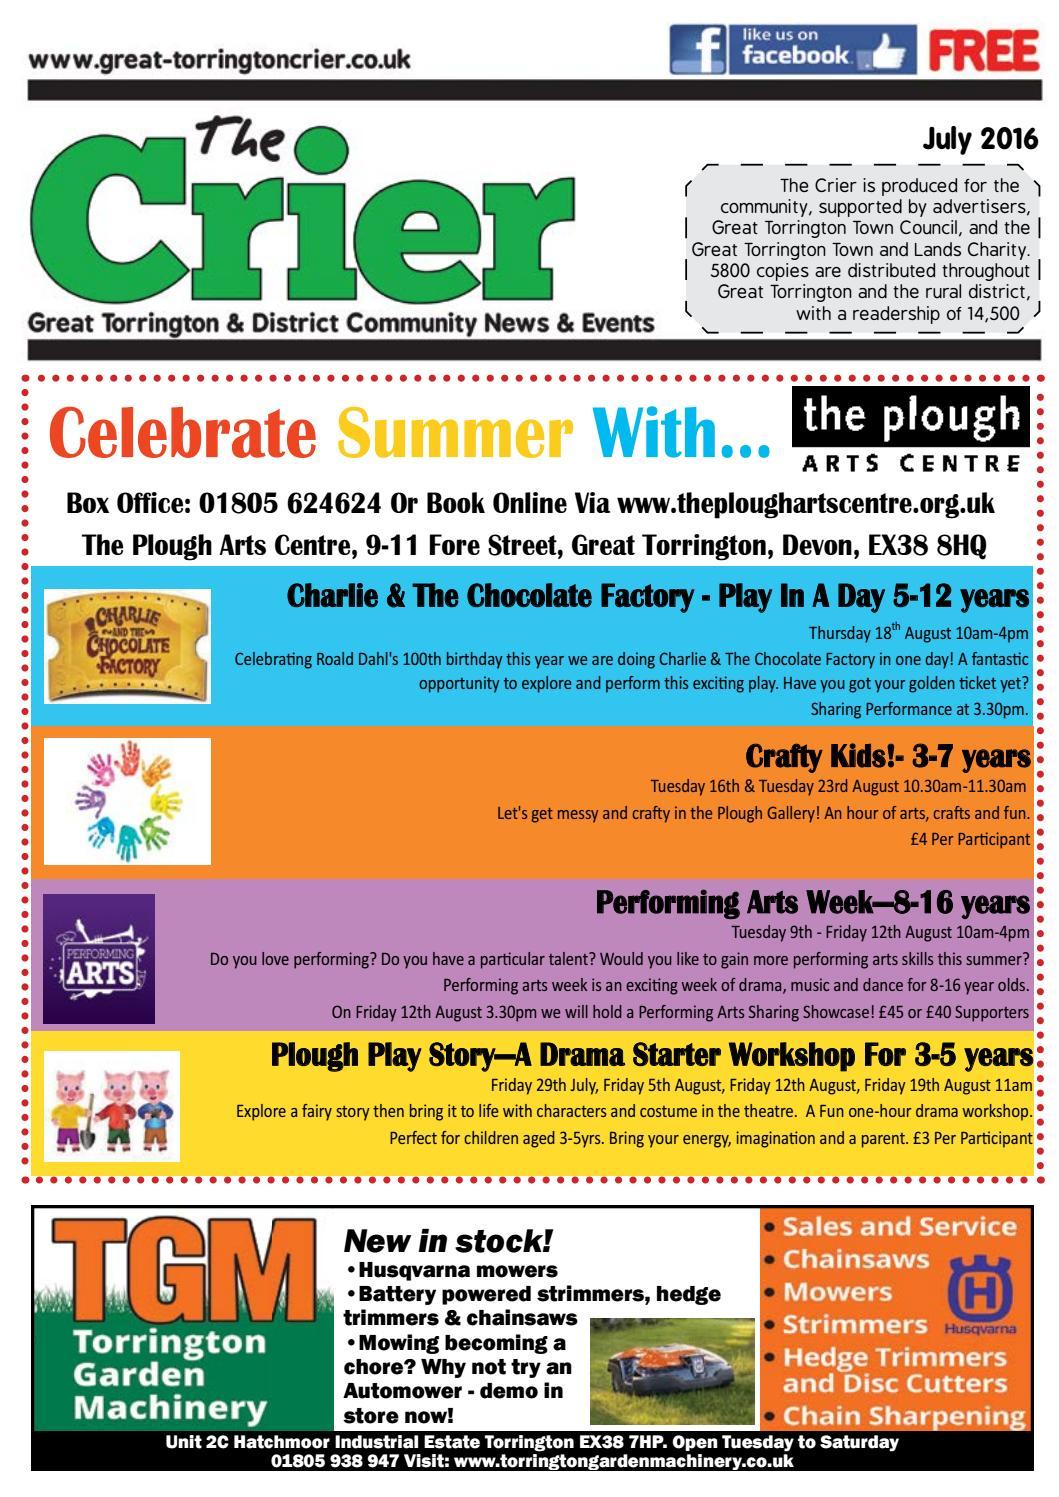 July Crier 2016 by The Torrington Crier - issuu